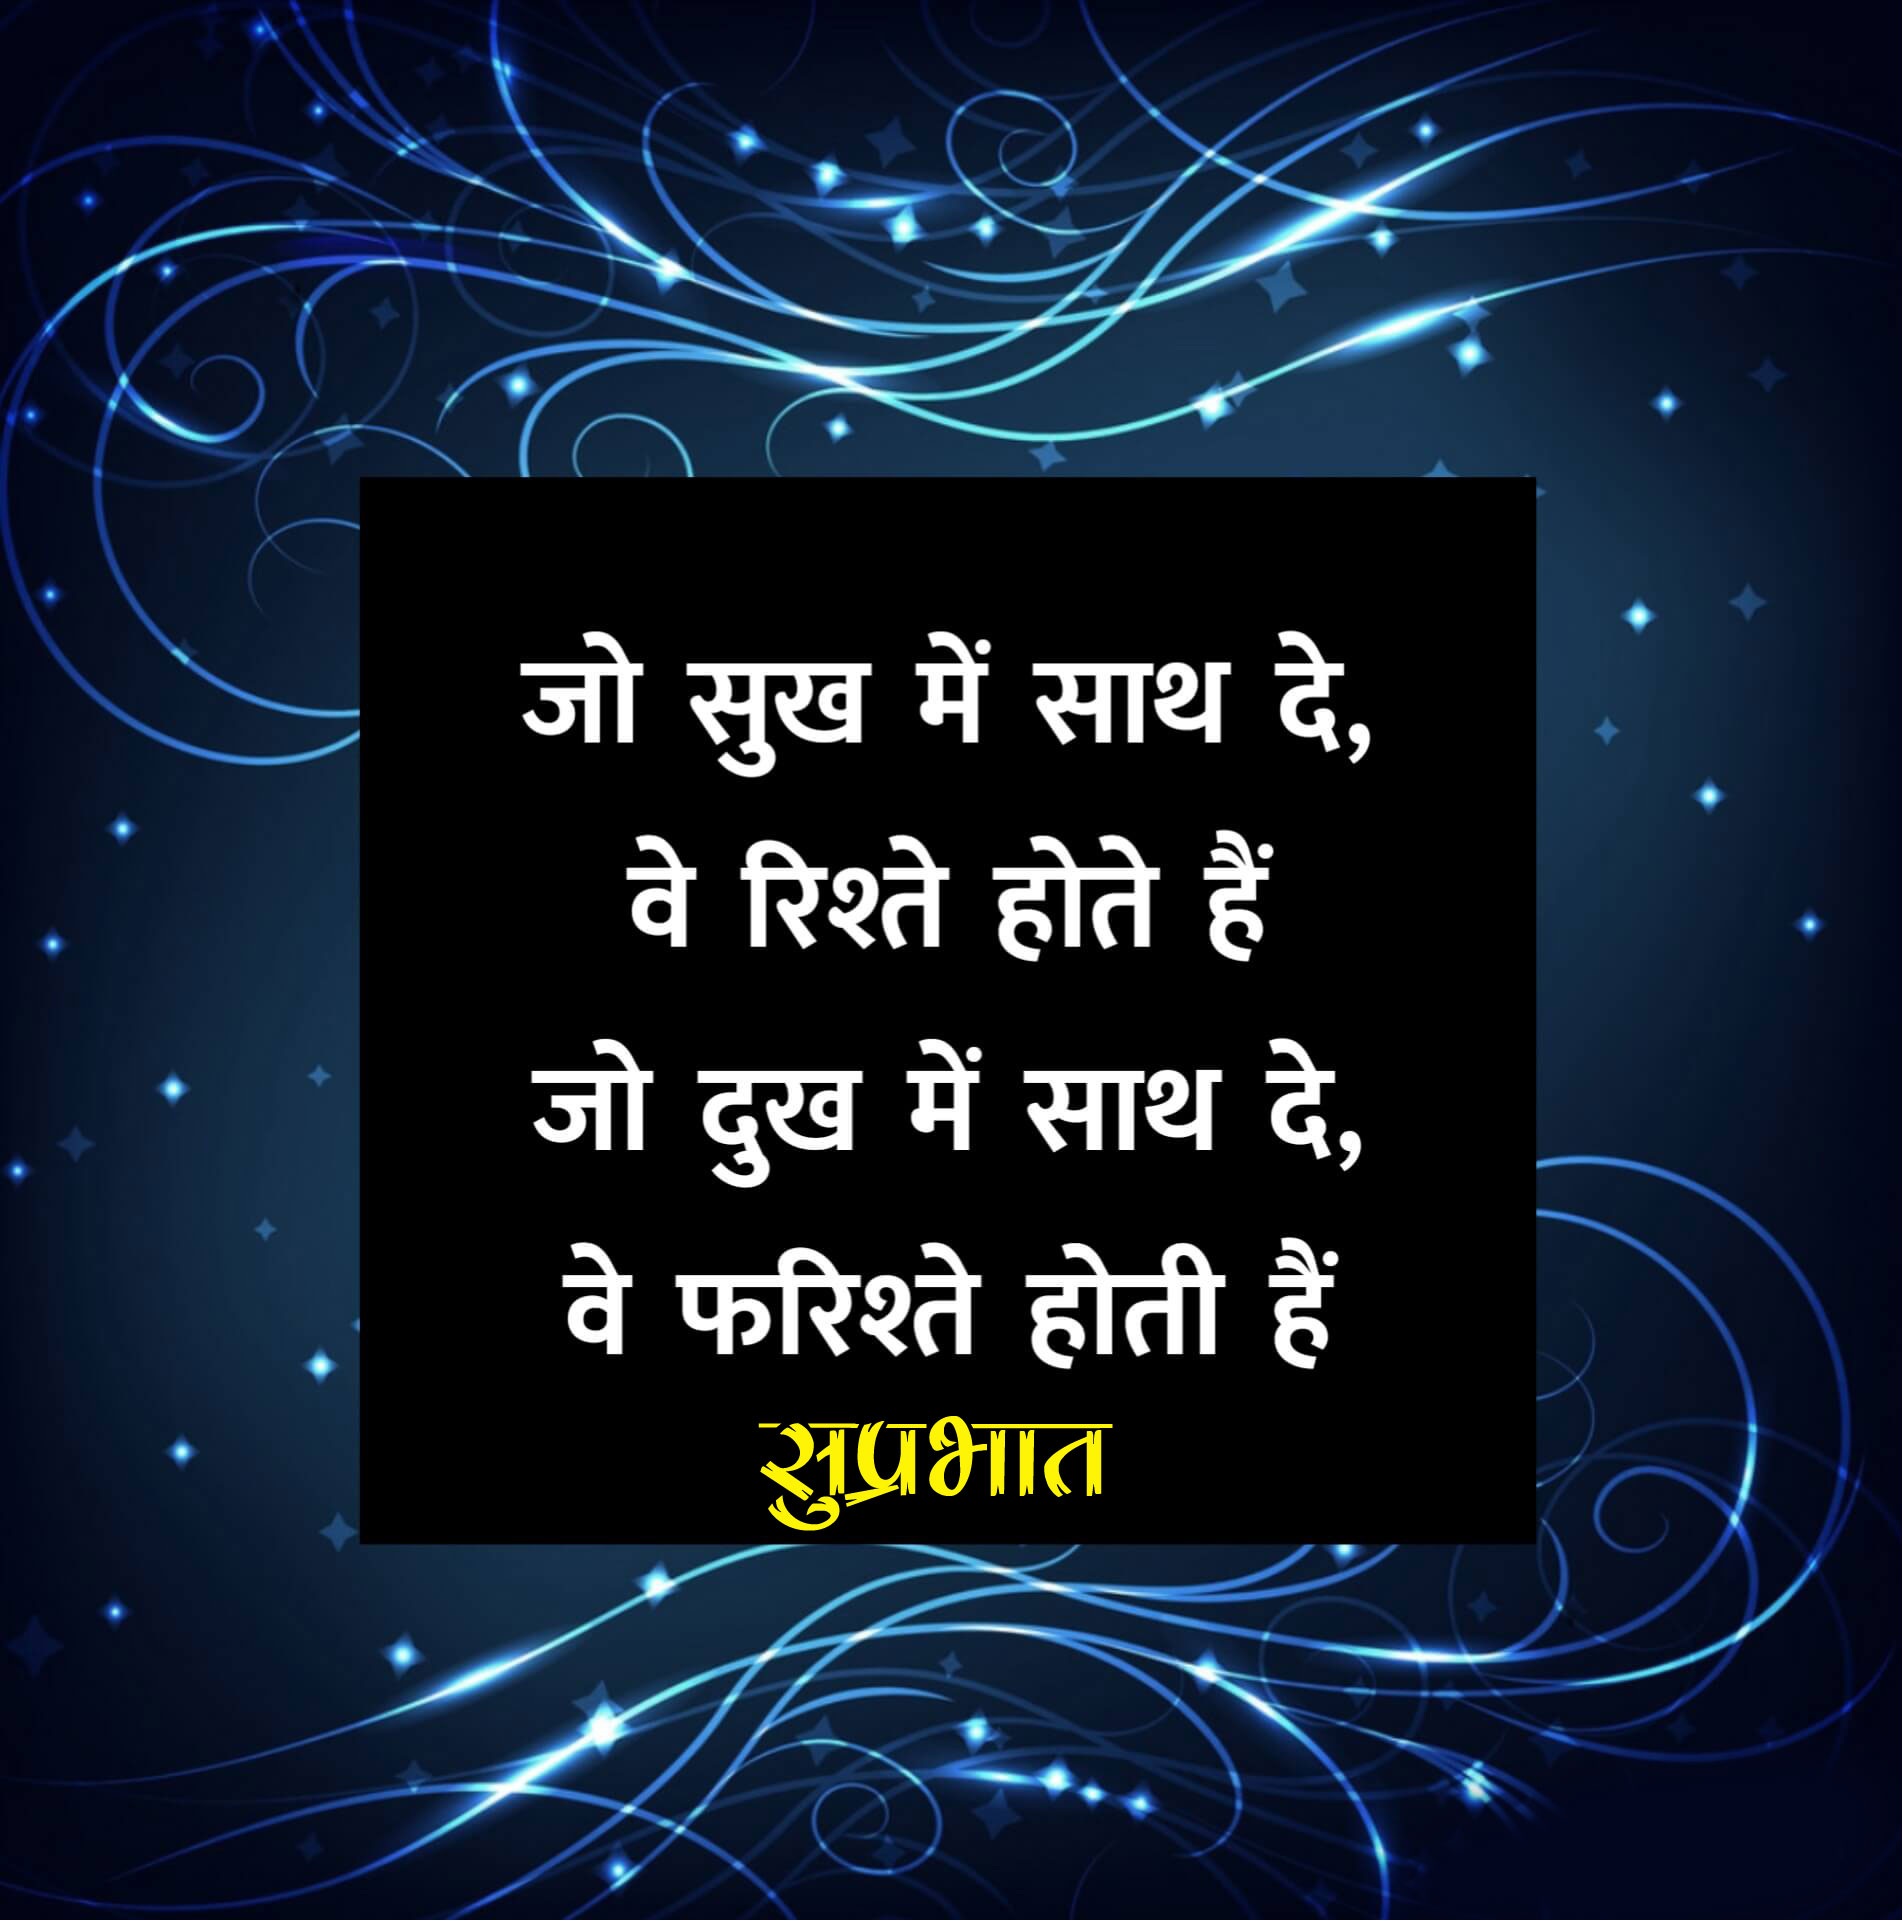 hindi download Beautiful Suprabhat Images